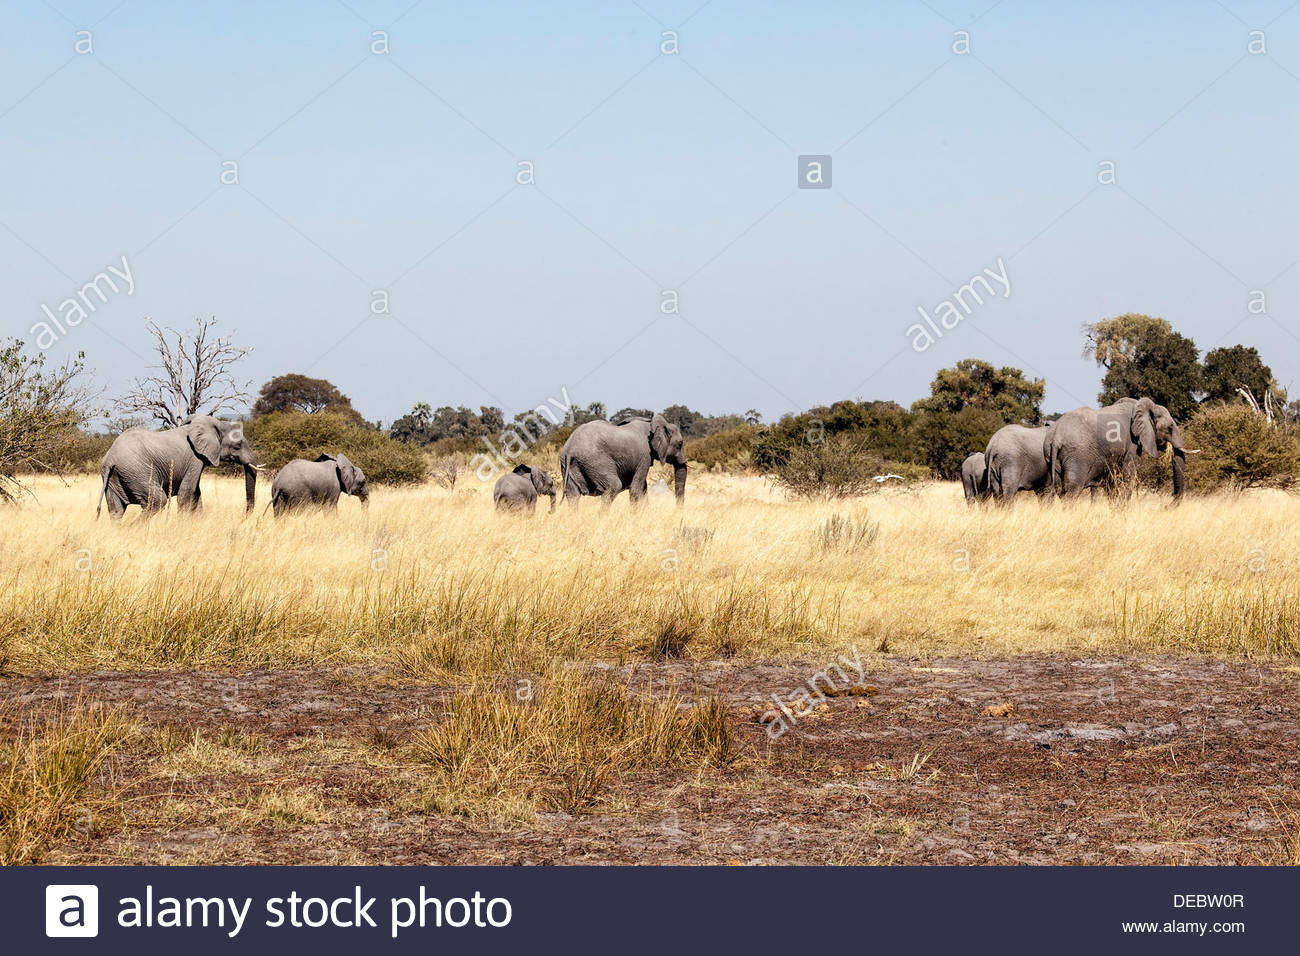 African elephant (Loxodonta africana) roam the savannah, Moremi Game Reserve, Botswana - Stock Image